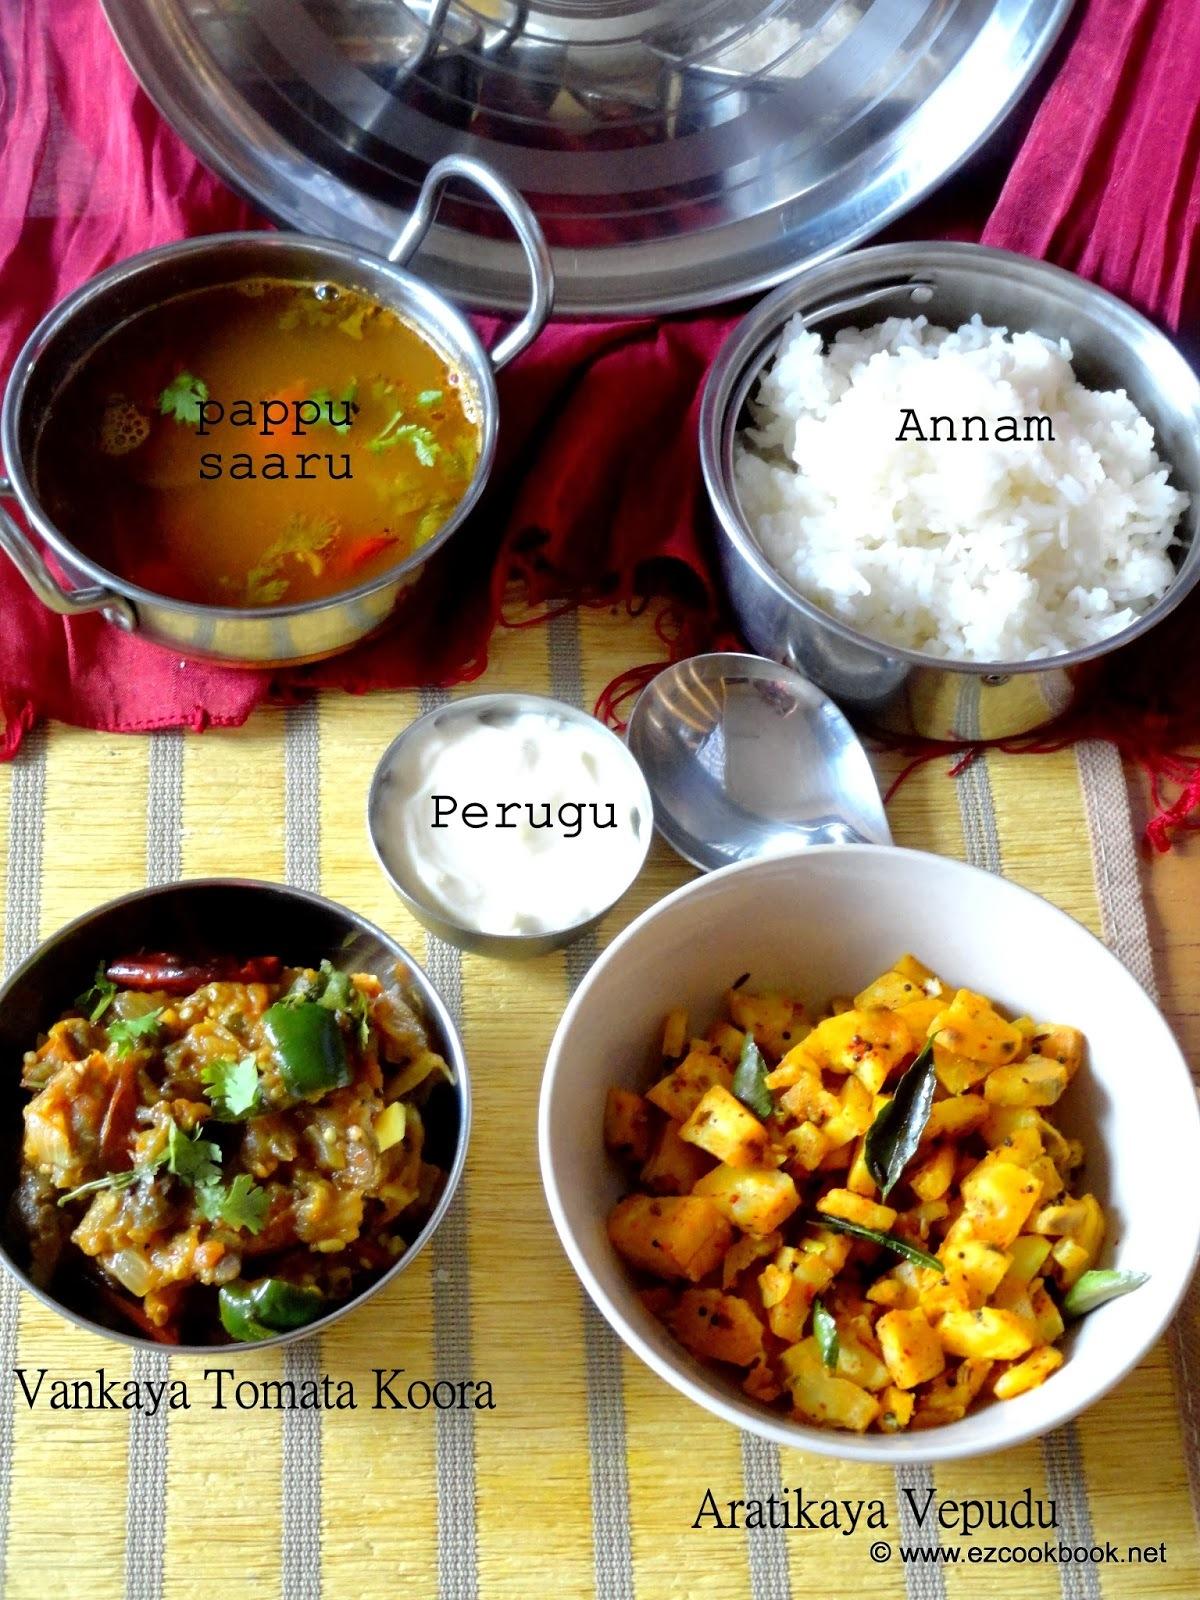 brinjal fry gujarati style